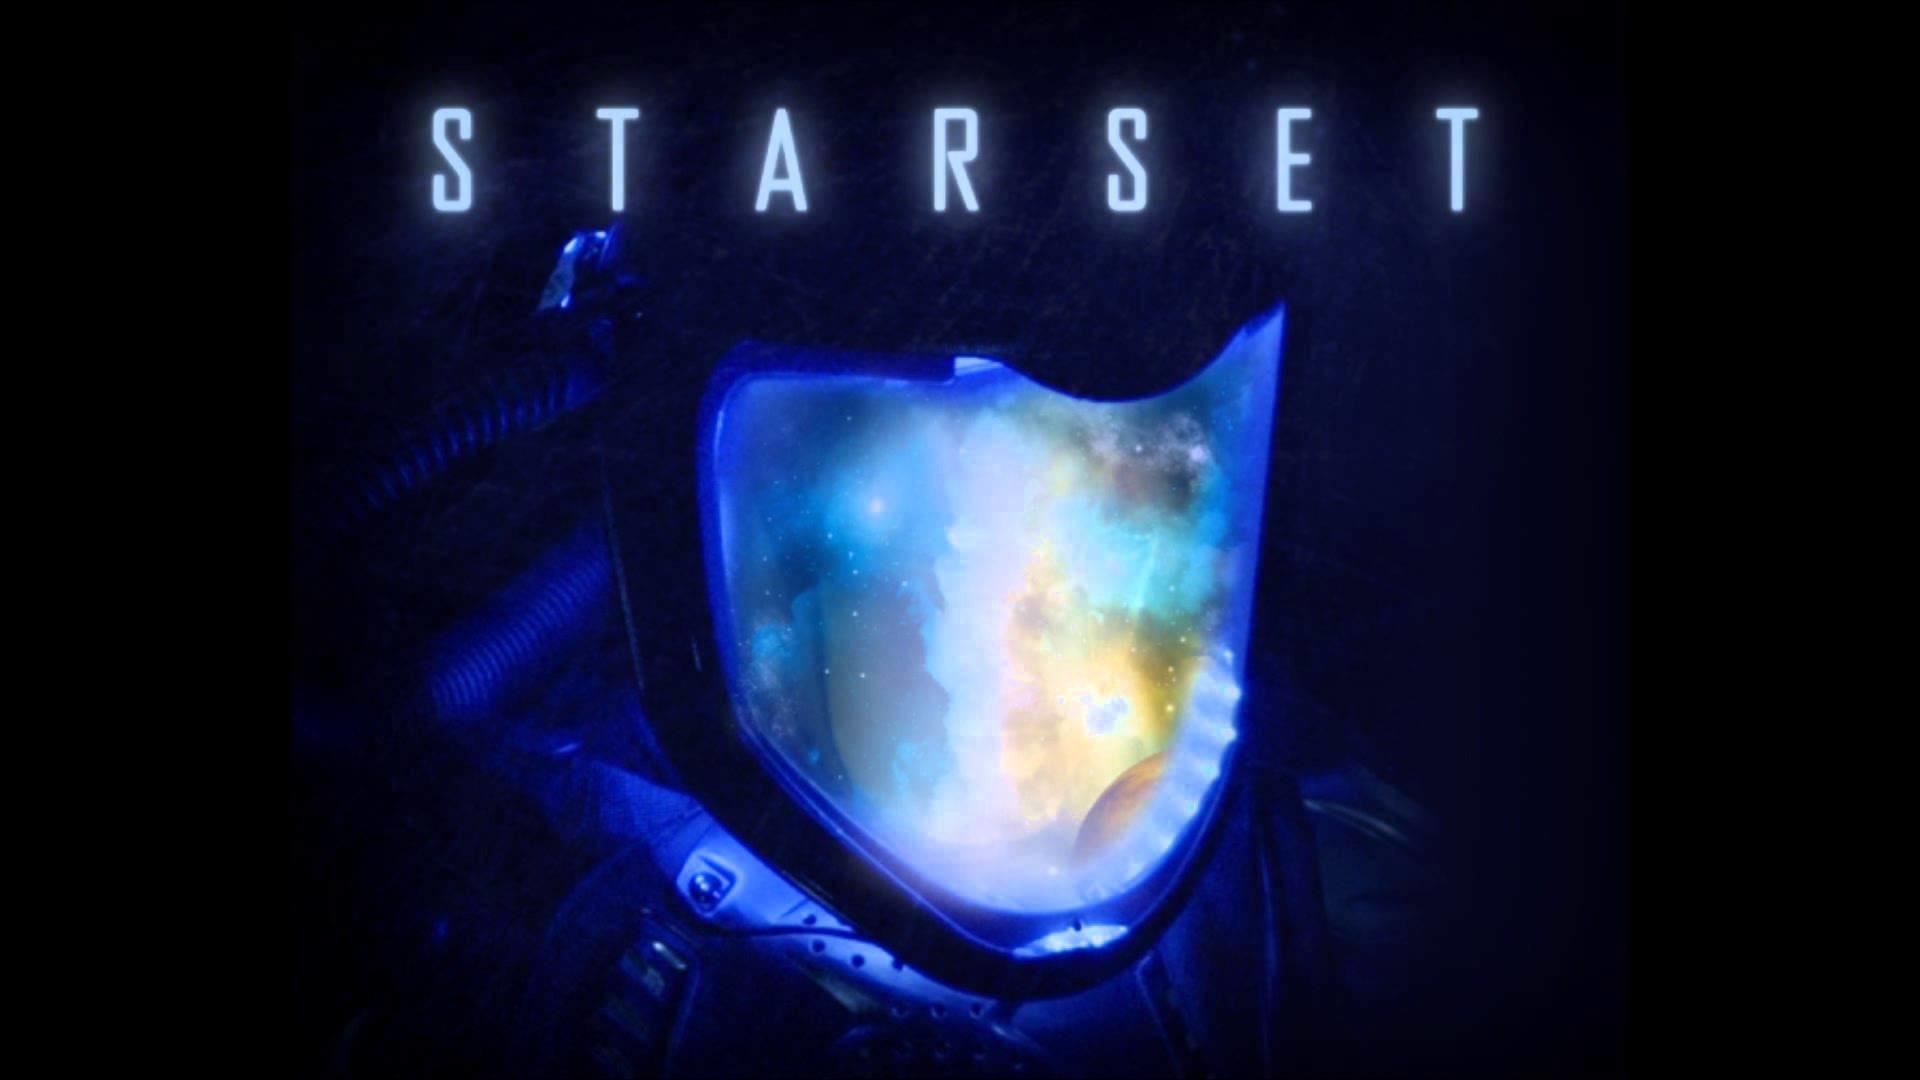 starset transmissions full album download free